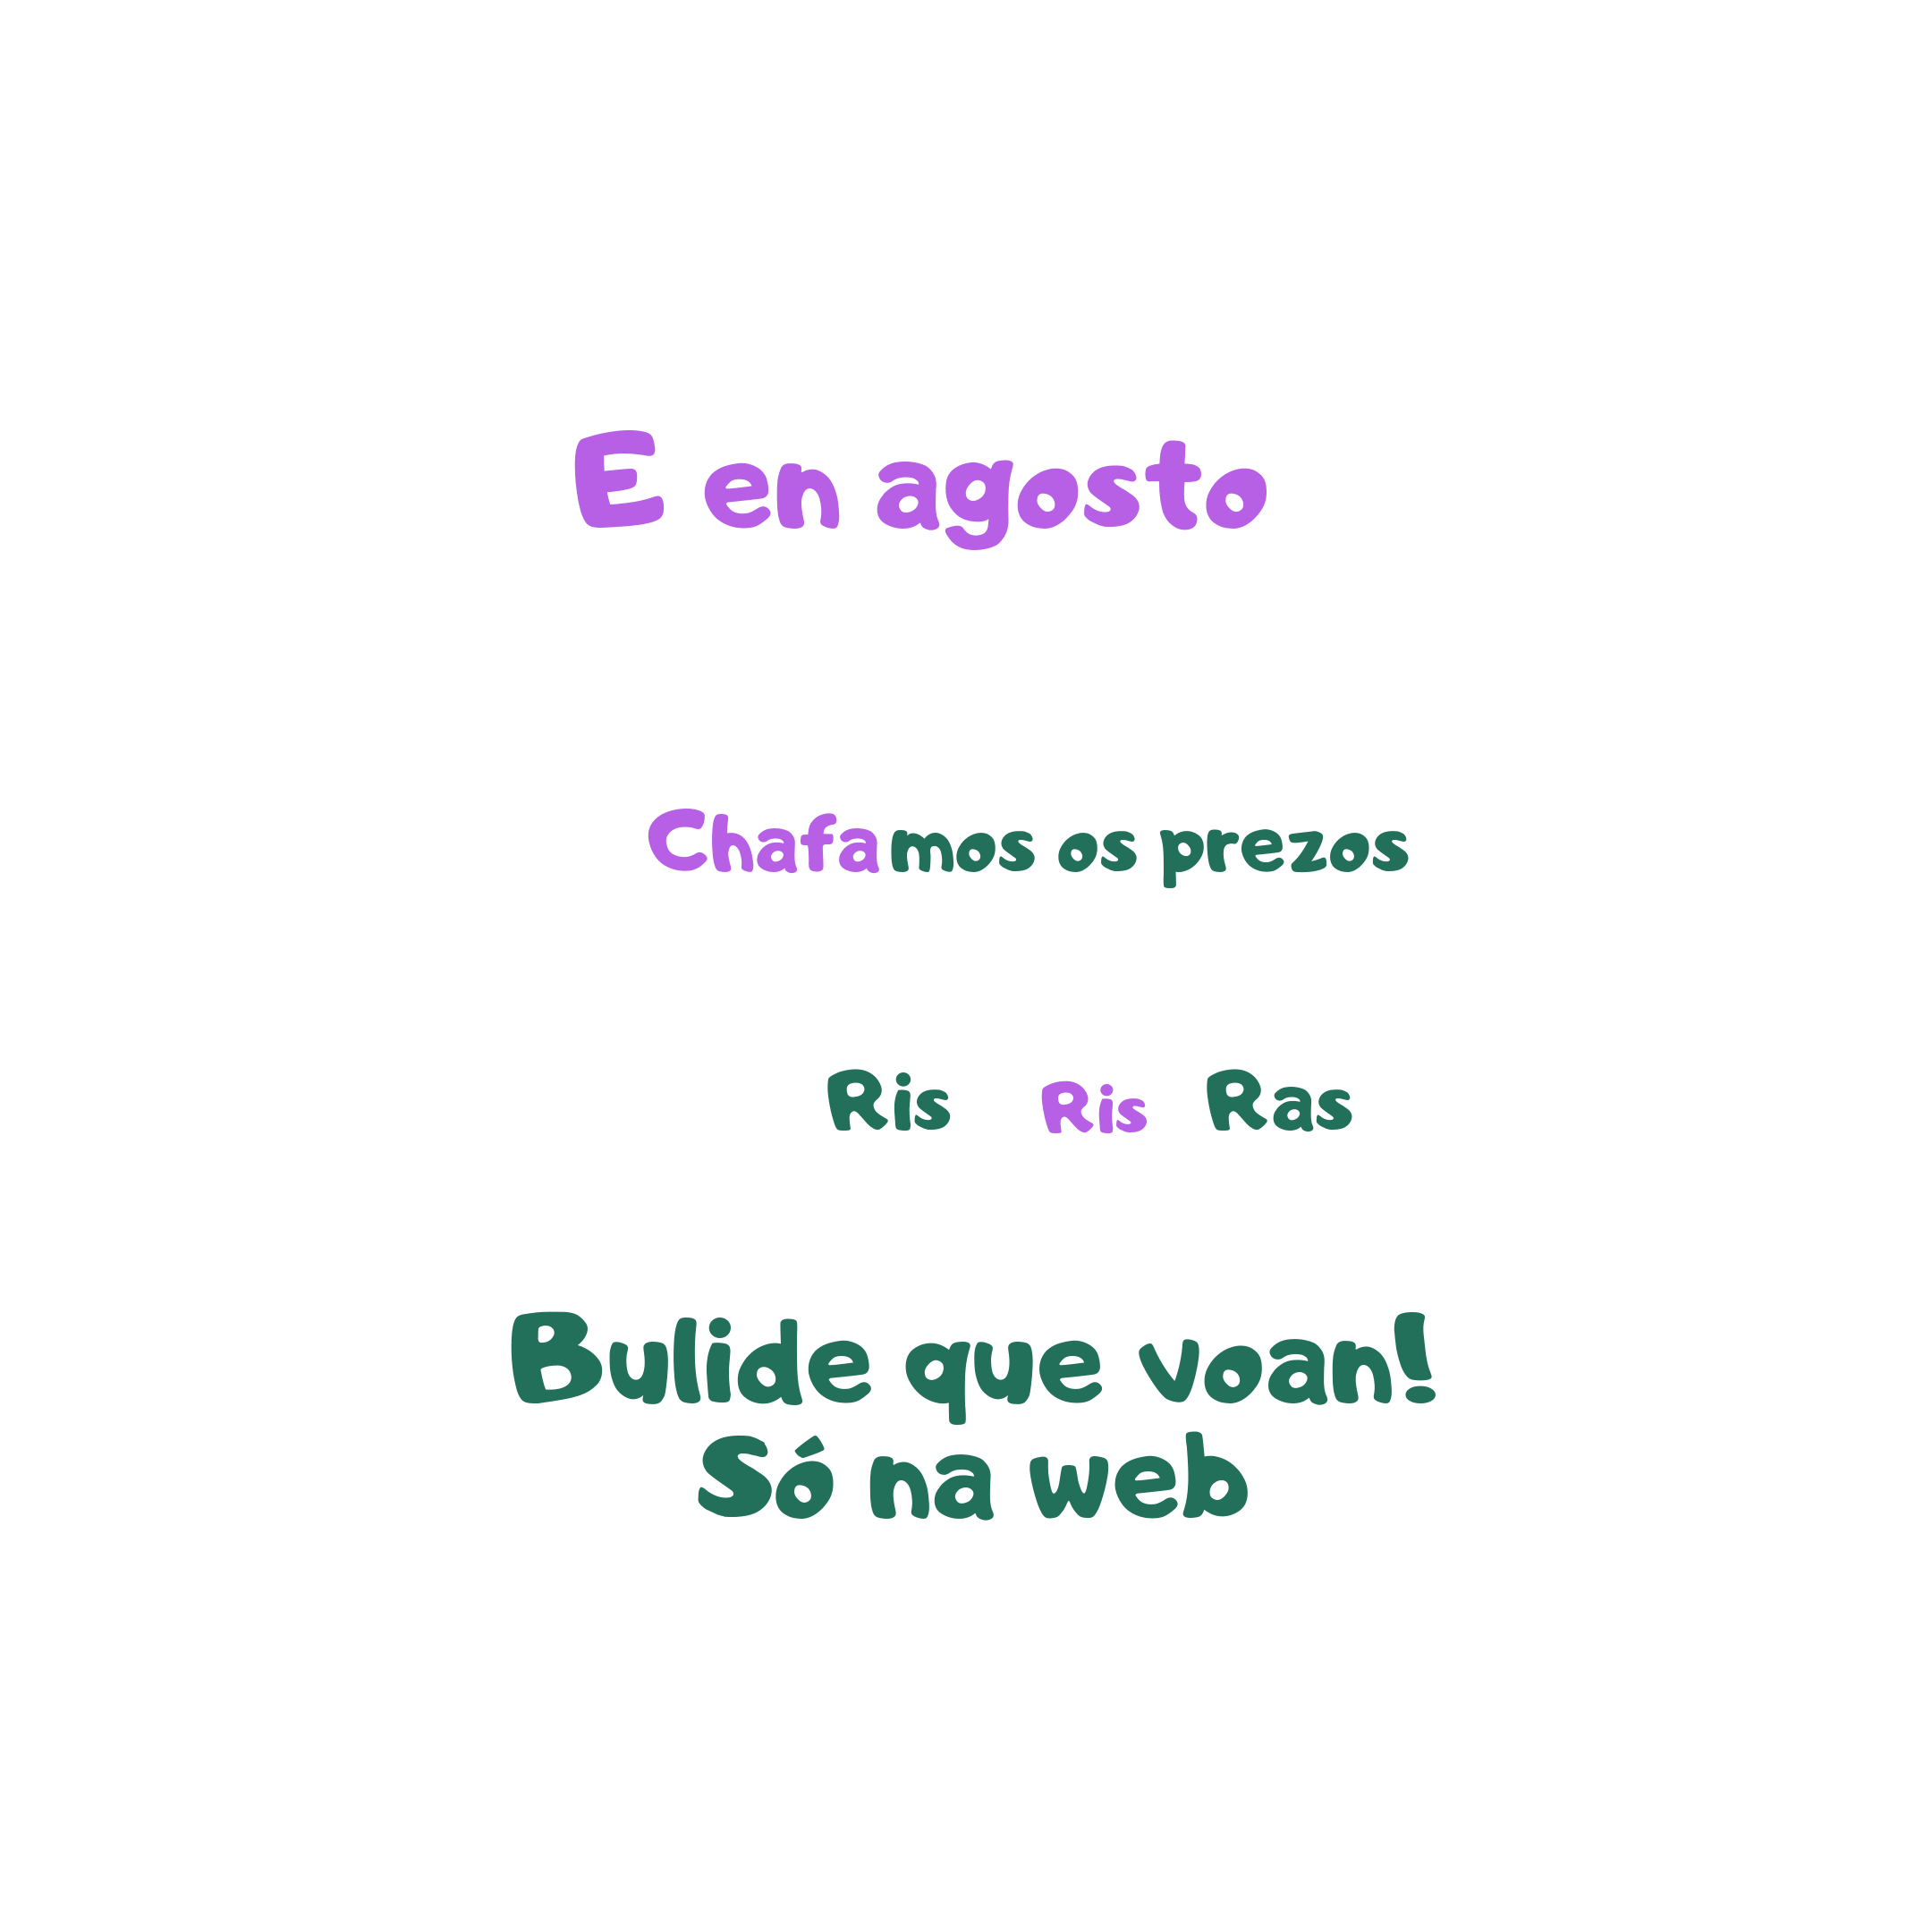 circulo-galego-min-1-